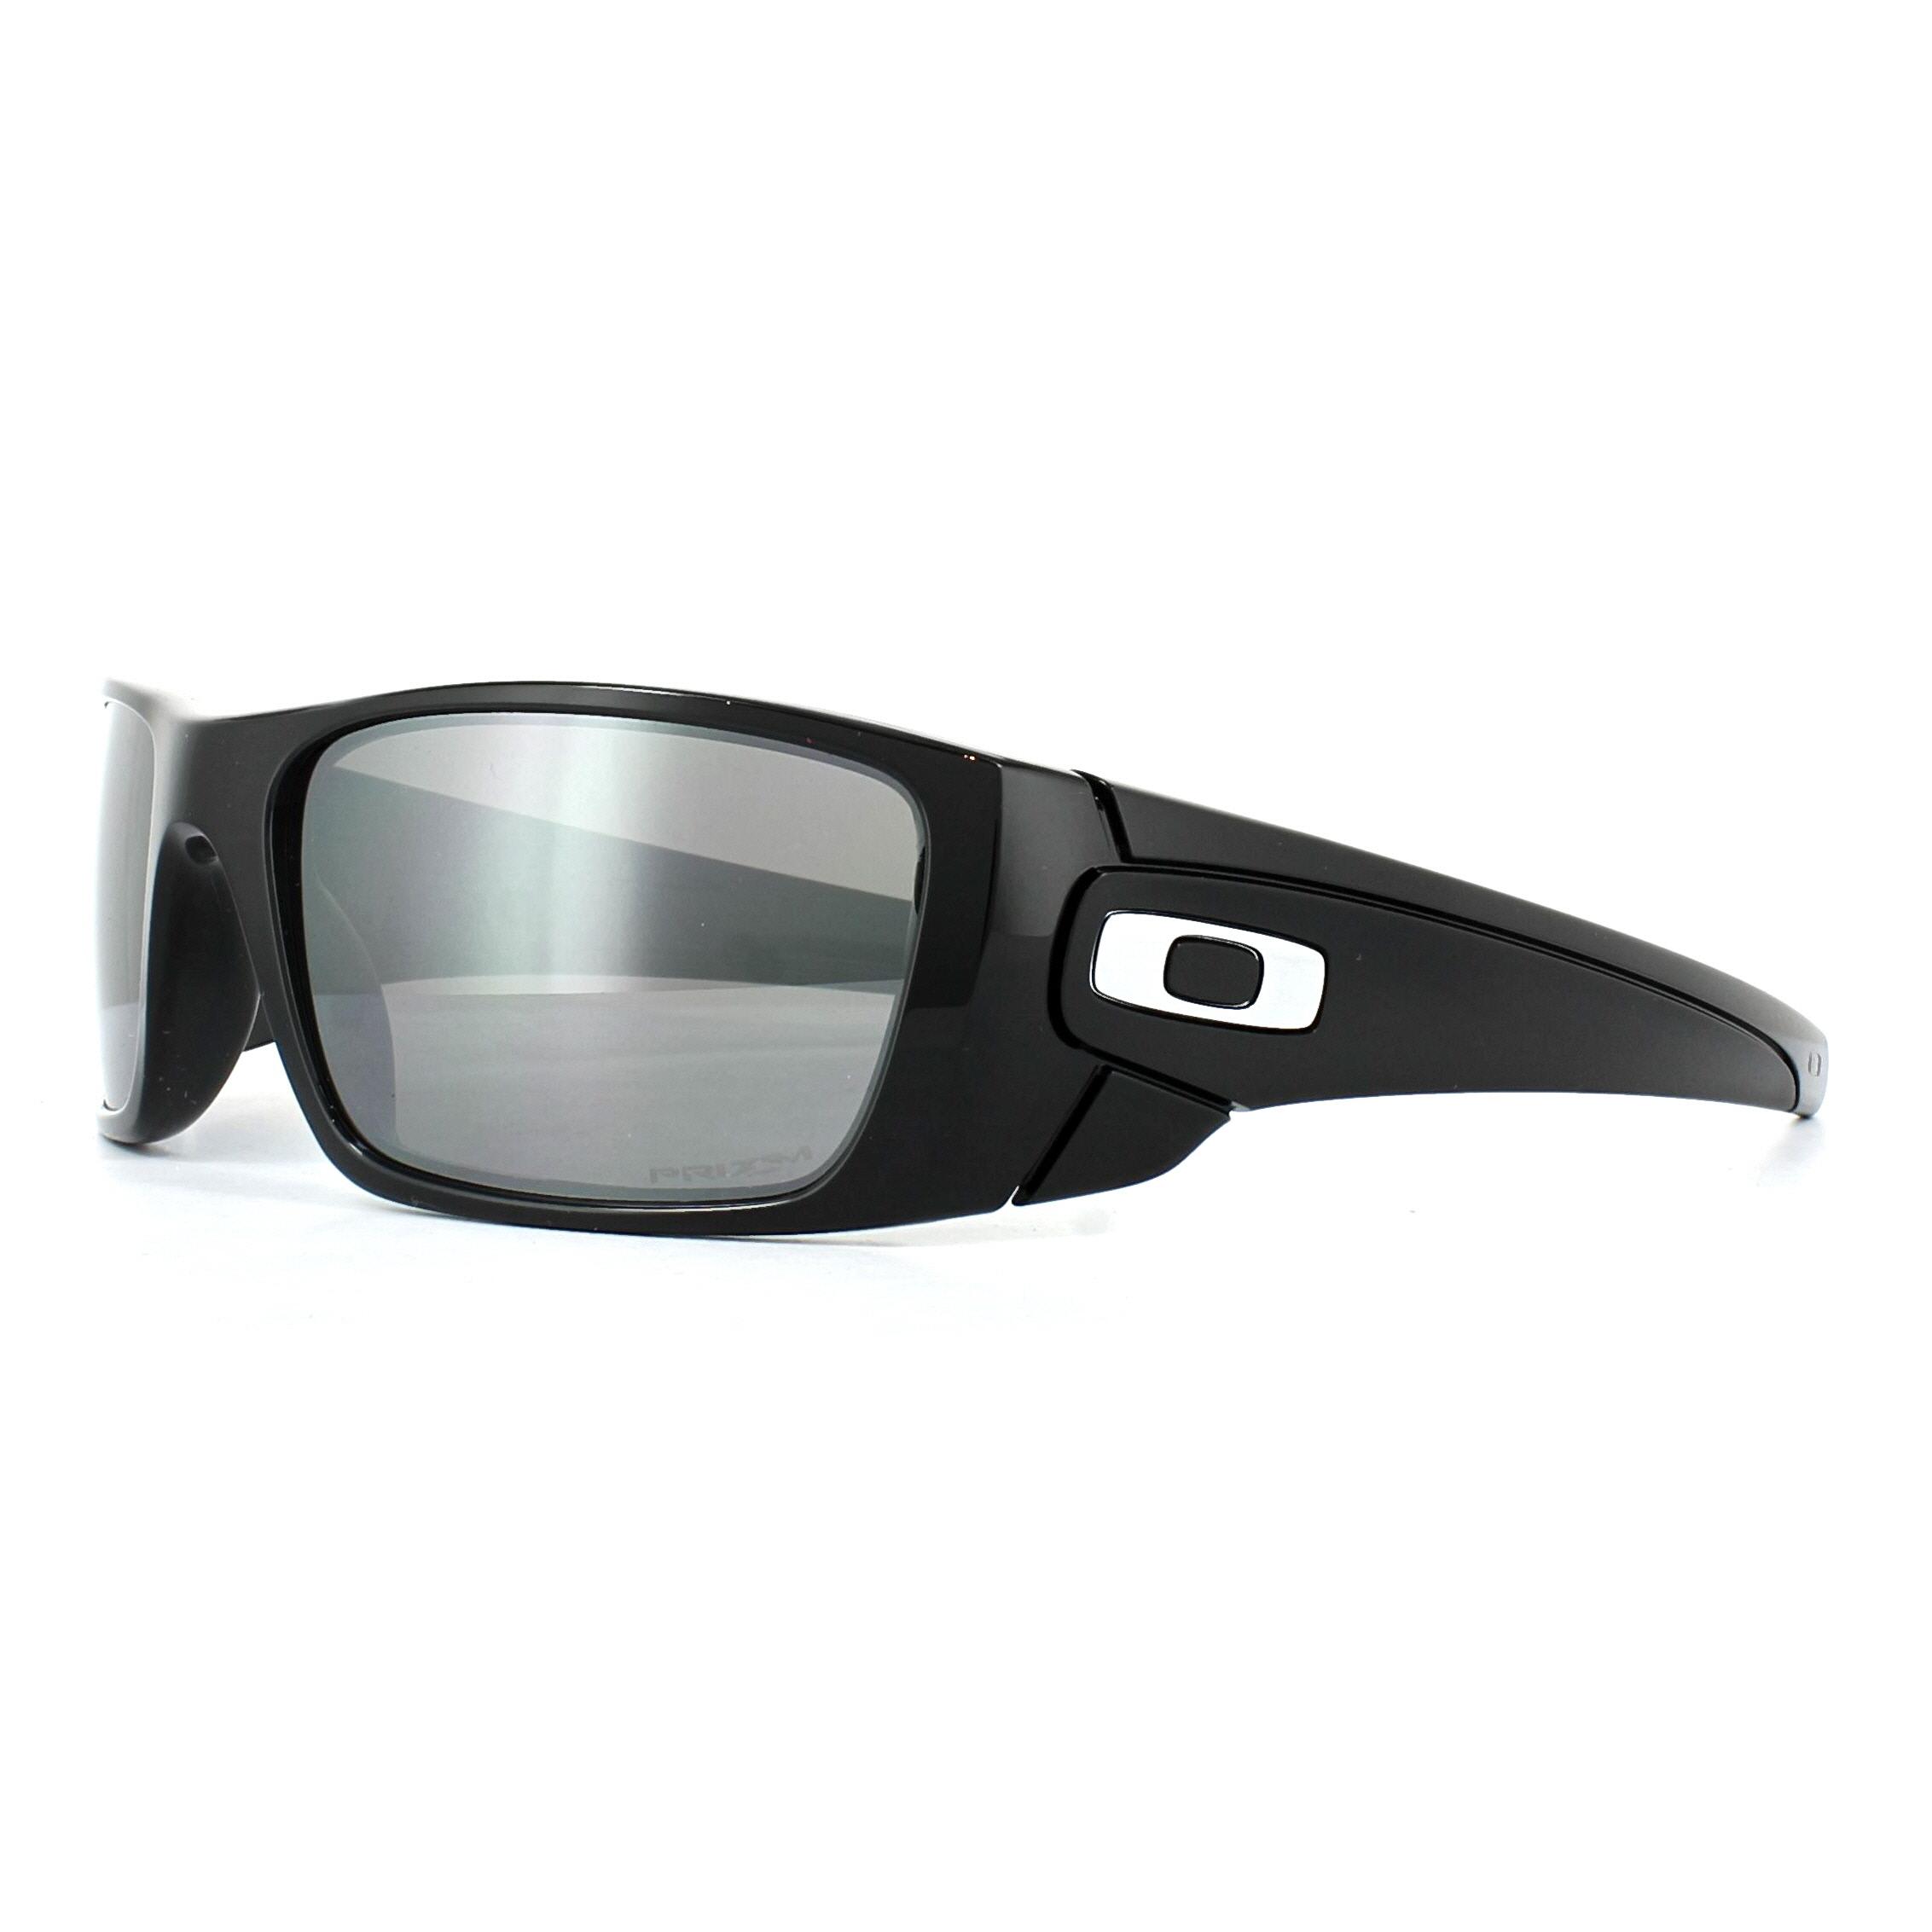 08fadd5cef Sentinel Oakley Sunglasses Fuel Cell OO9096-J5 Polished Black Prizm Black.  Sentinel Thumbnail 2